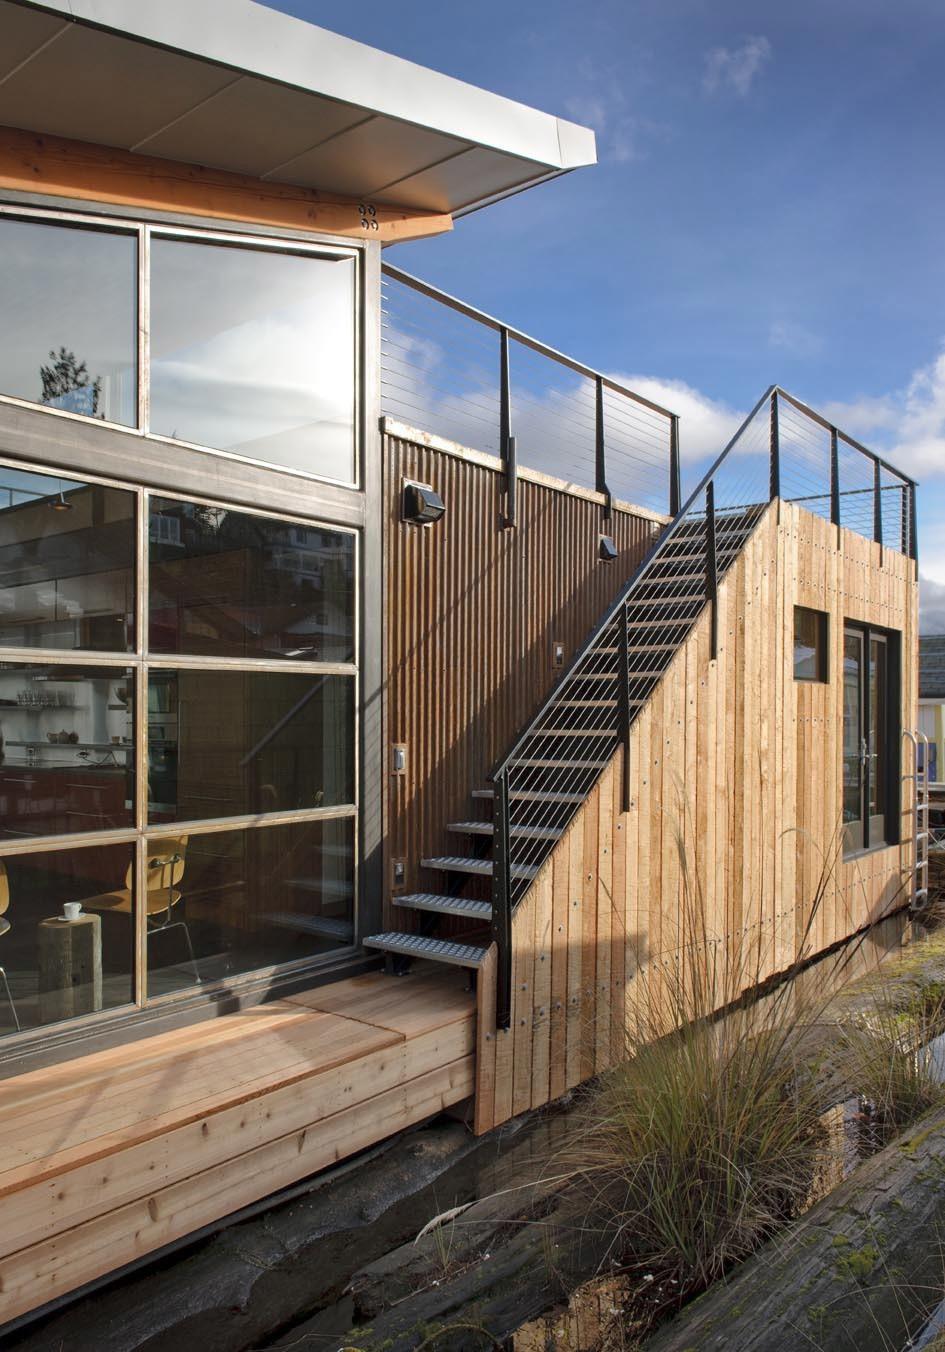 Portage Bay Floating Home in Seattle, WA by Kim Mankoski/Ninebark Design Build LLC